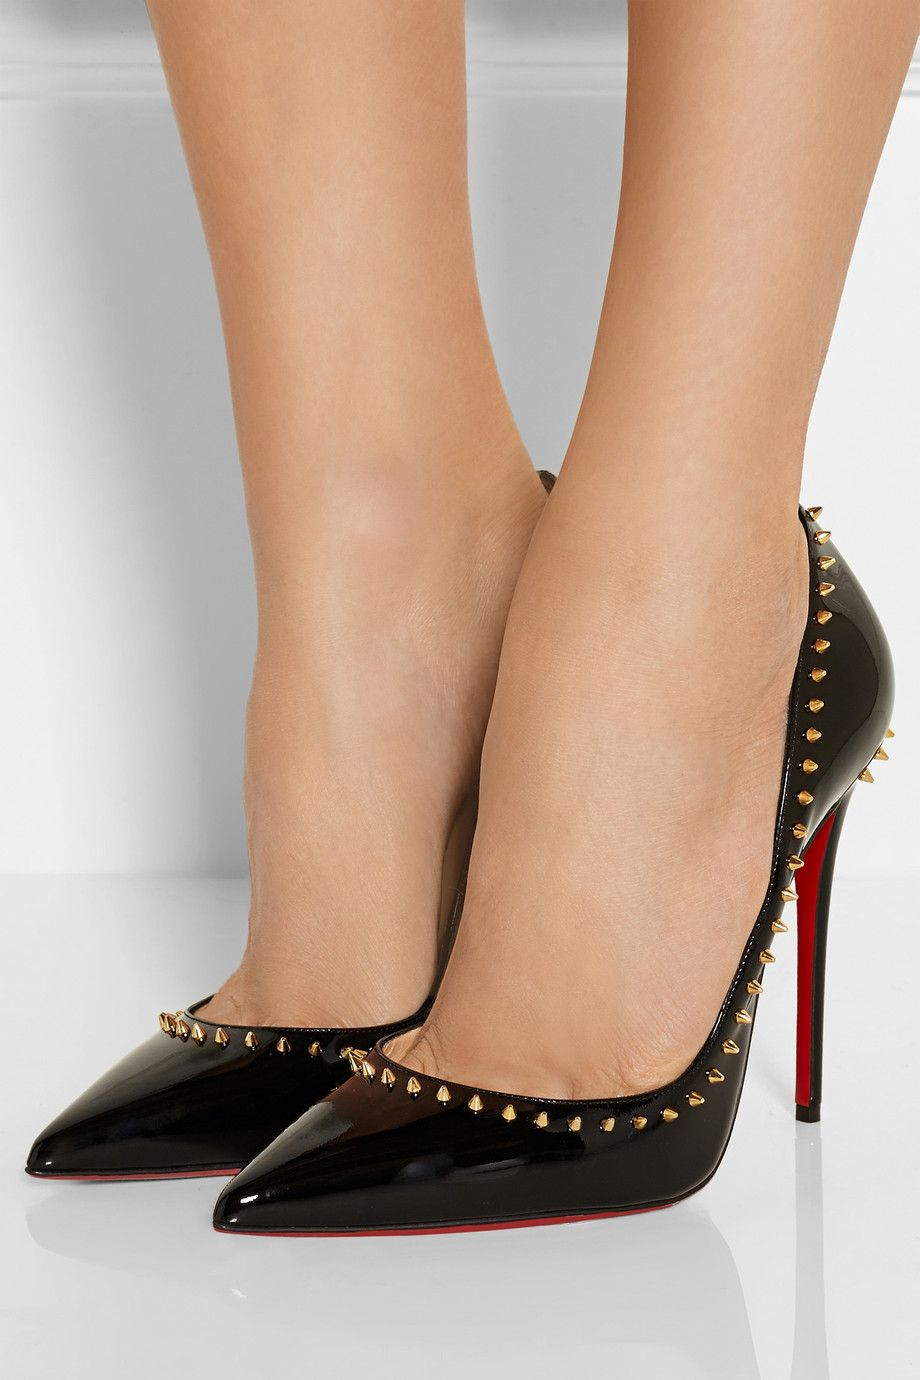 d630875c0b6e Christian Louboutin - Anjalina 120 studded patent-leather pumps ...